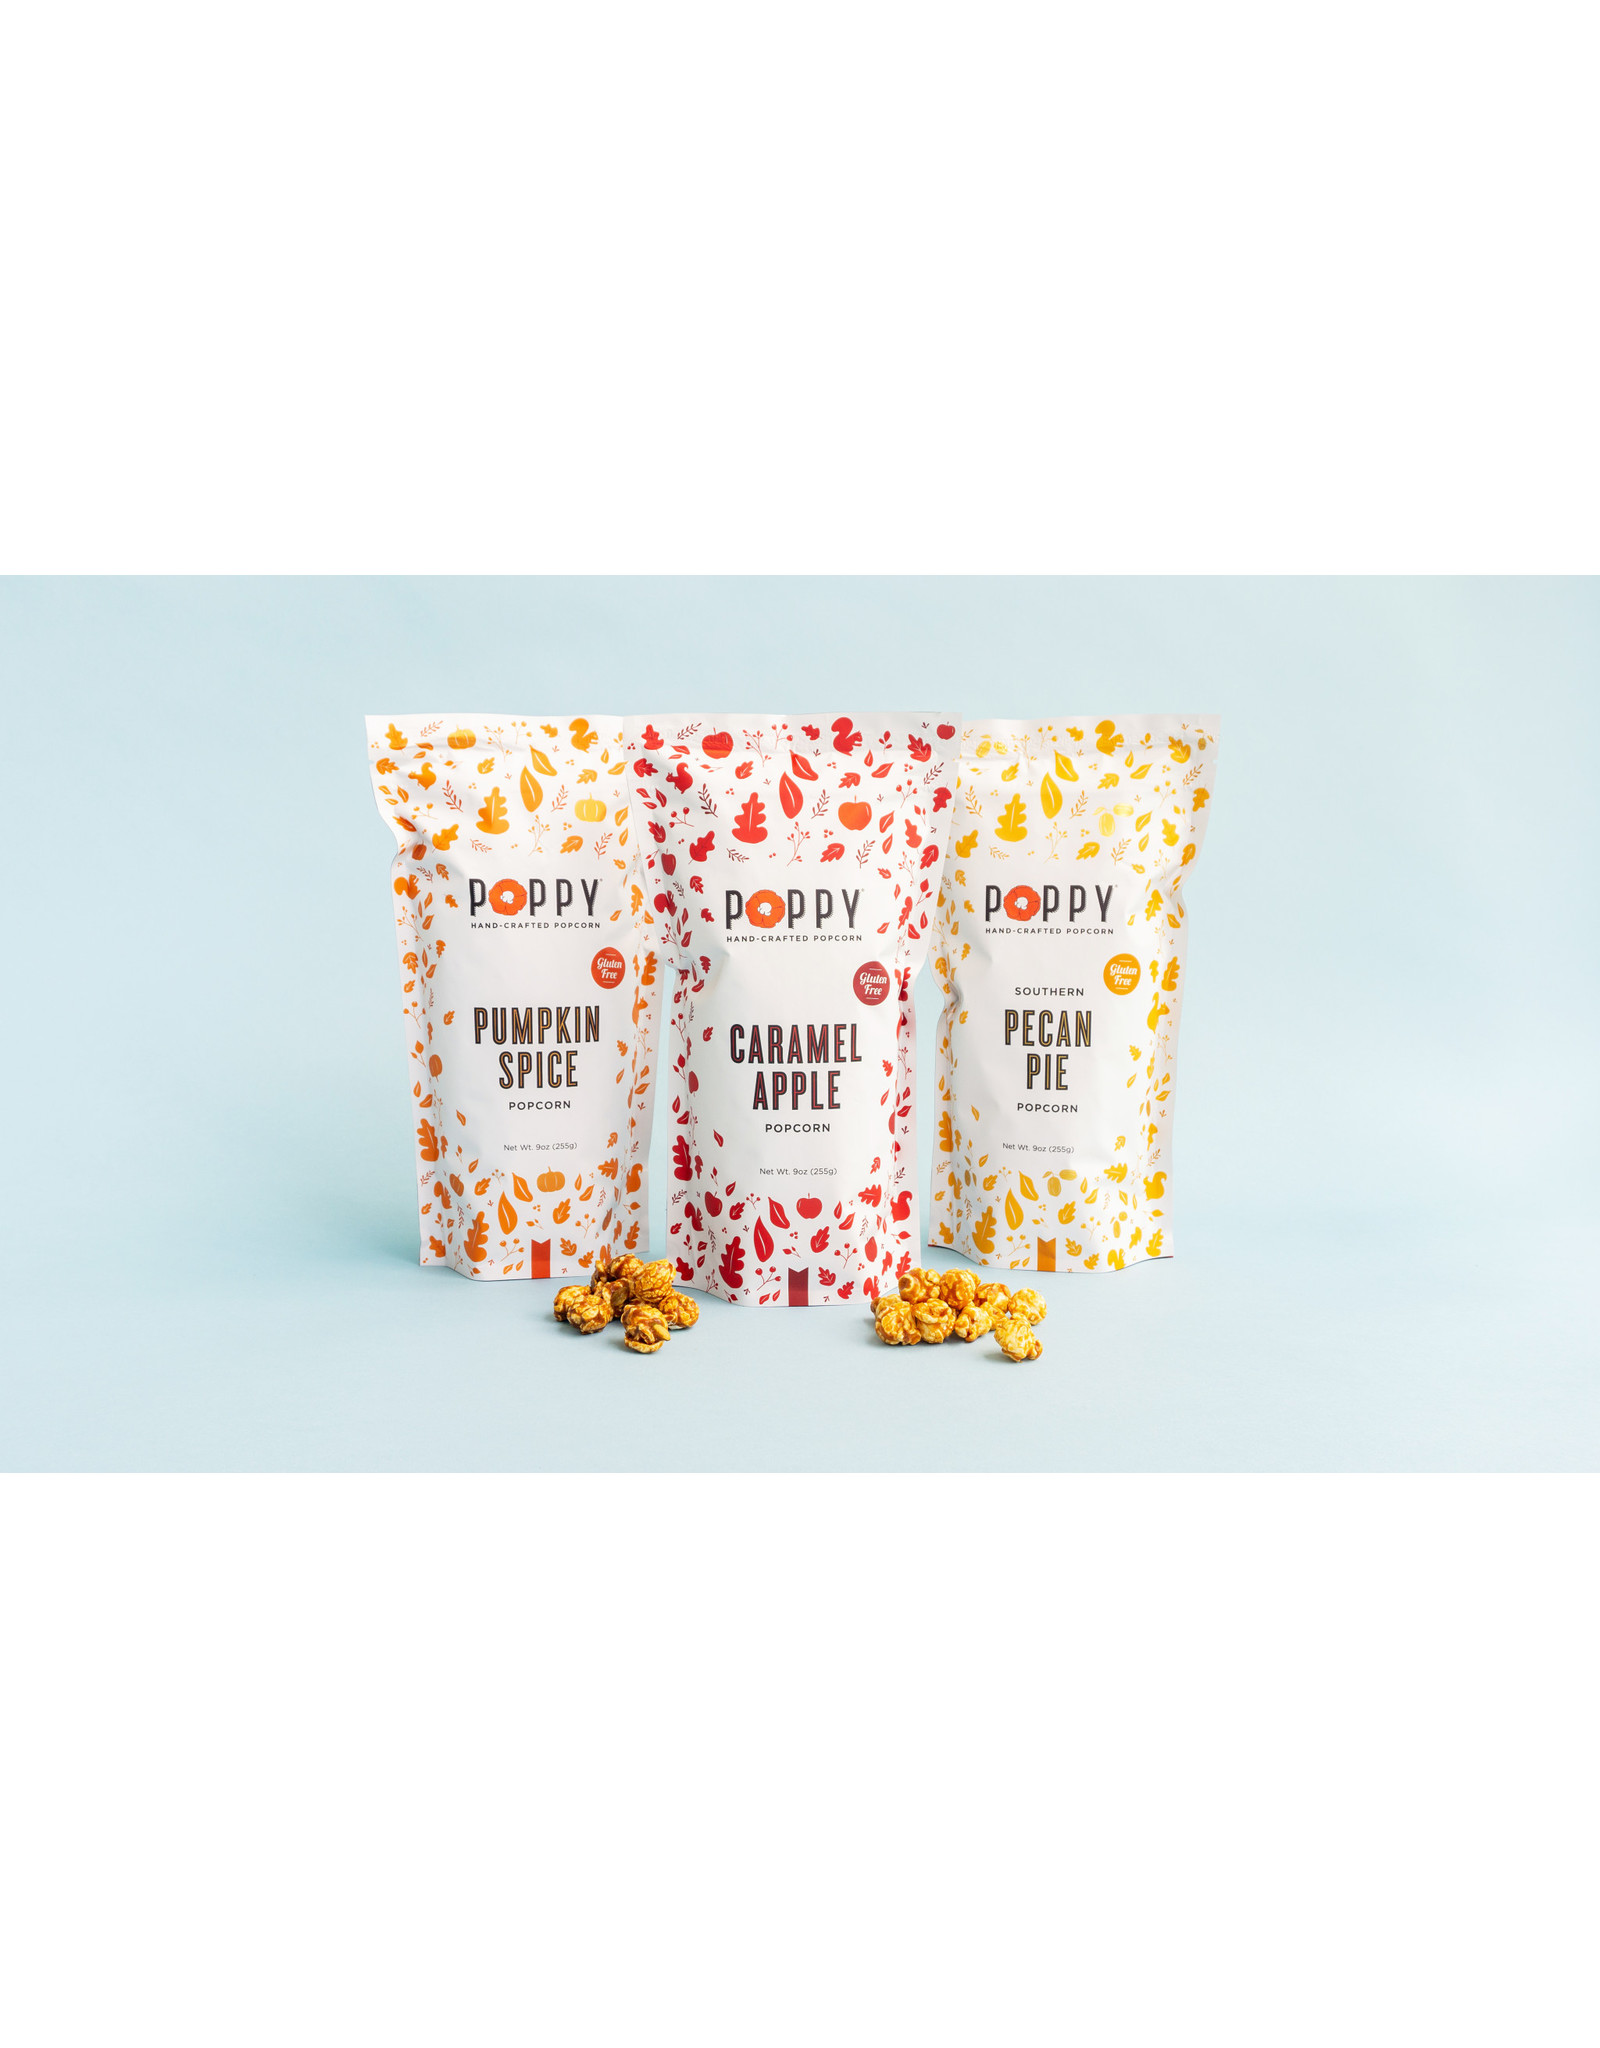 Poppy Caramel Apple Popcorn Market Bag